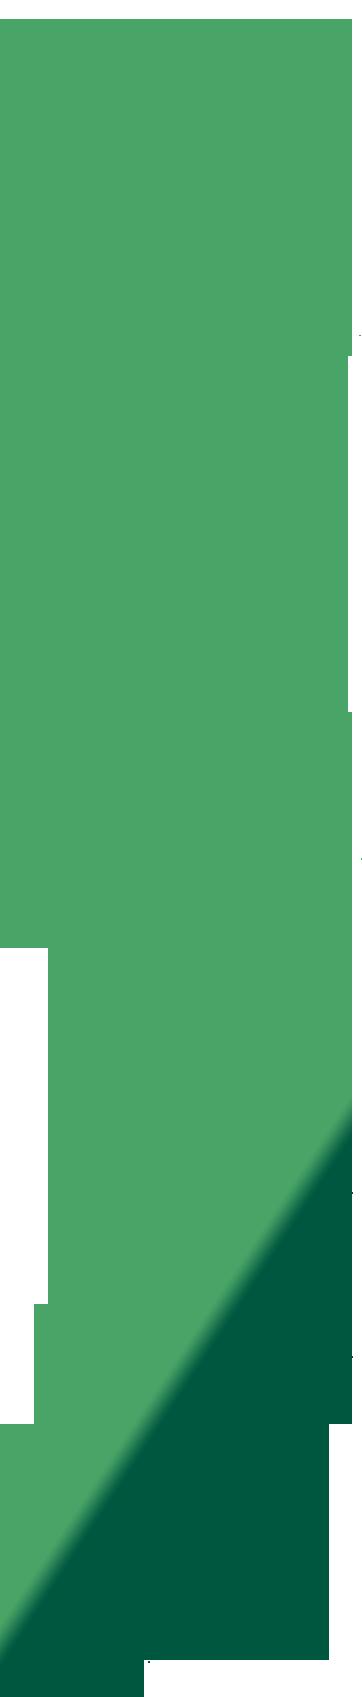 LeHuppé_ROGÉ_ILLUSTRATION_arbres-01-Well